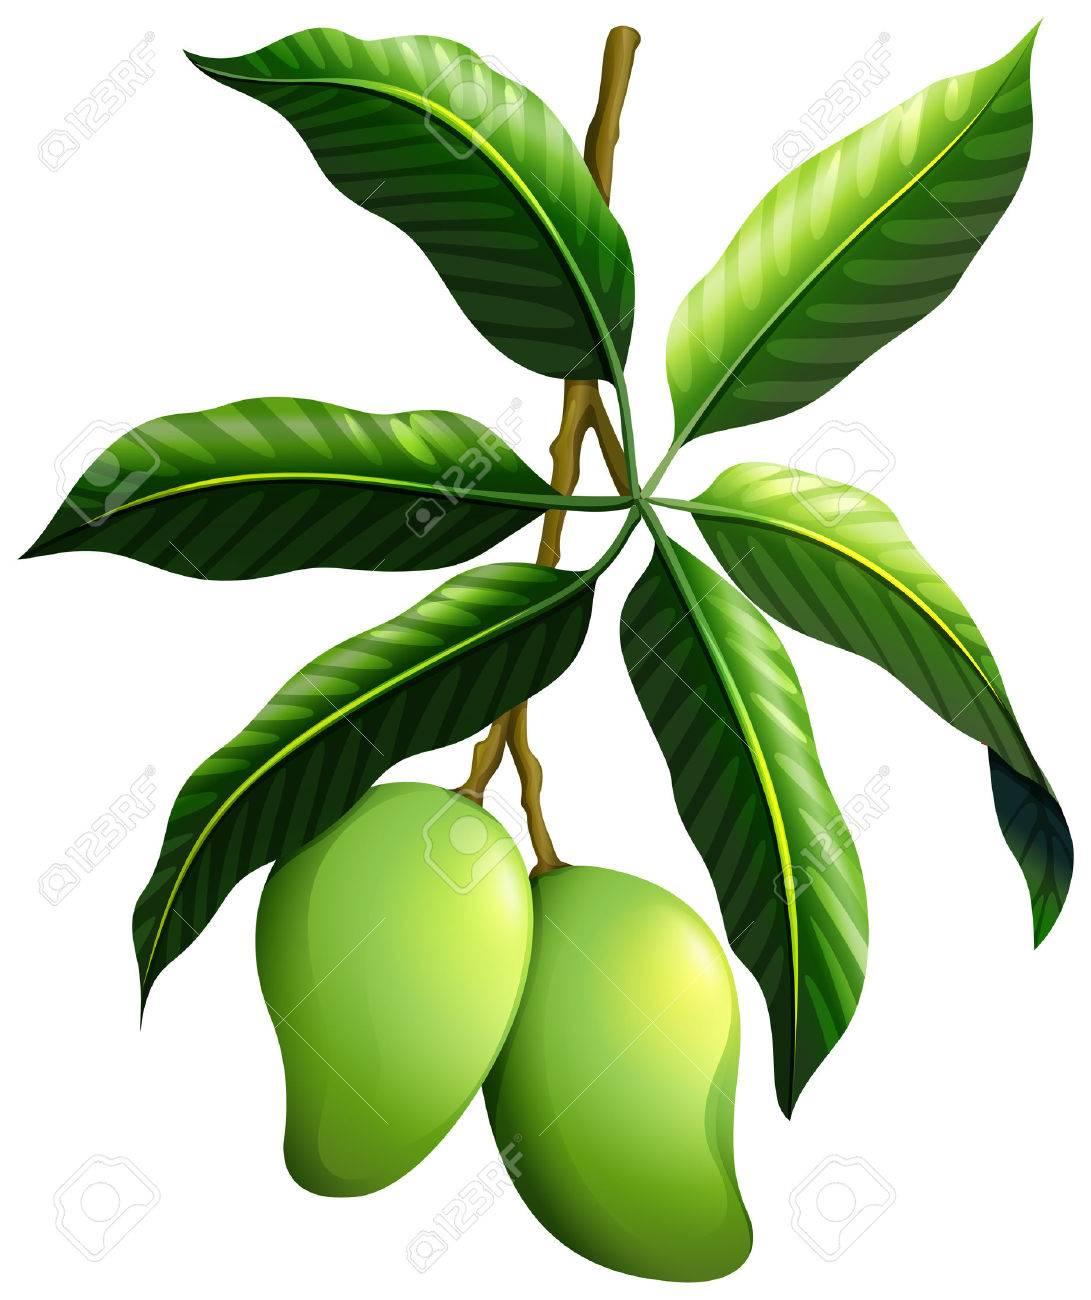 Mango clipart green mango. Station